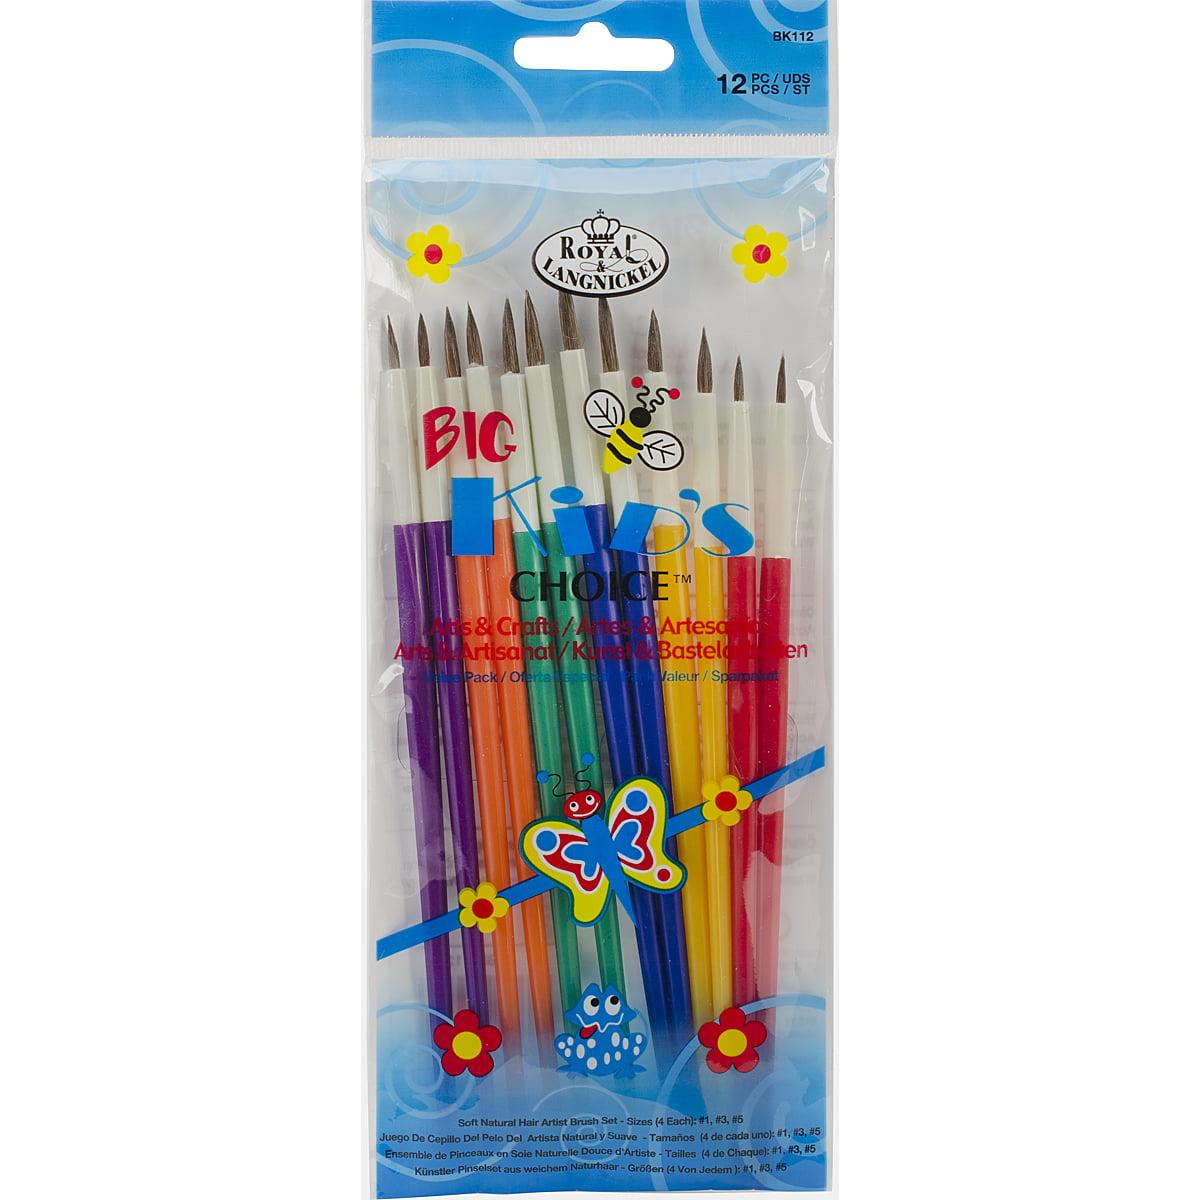 Big Kid's Choice Arts & Crafts Brush Set-12/Pkg